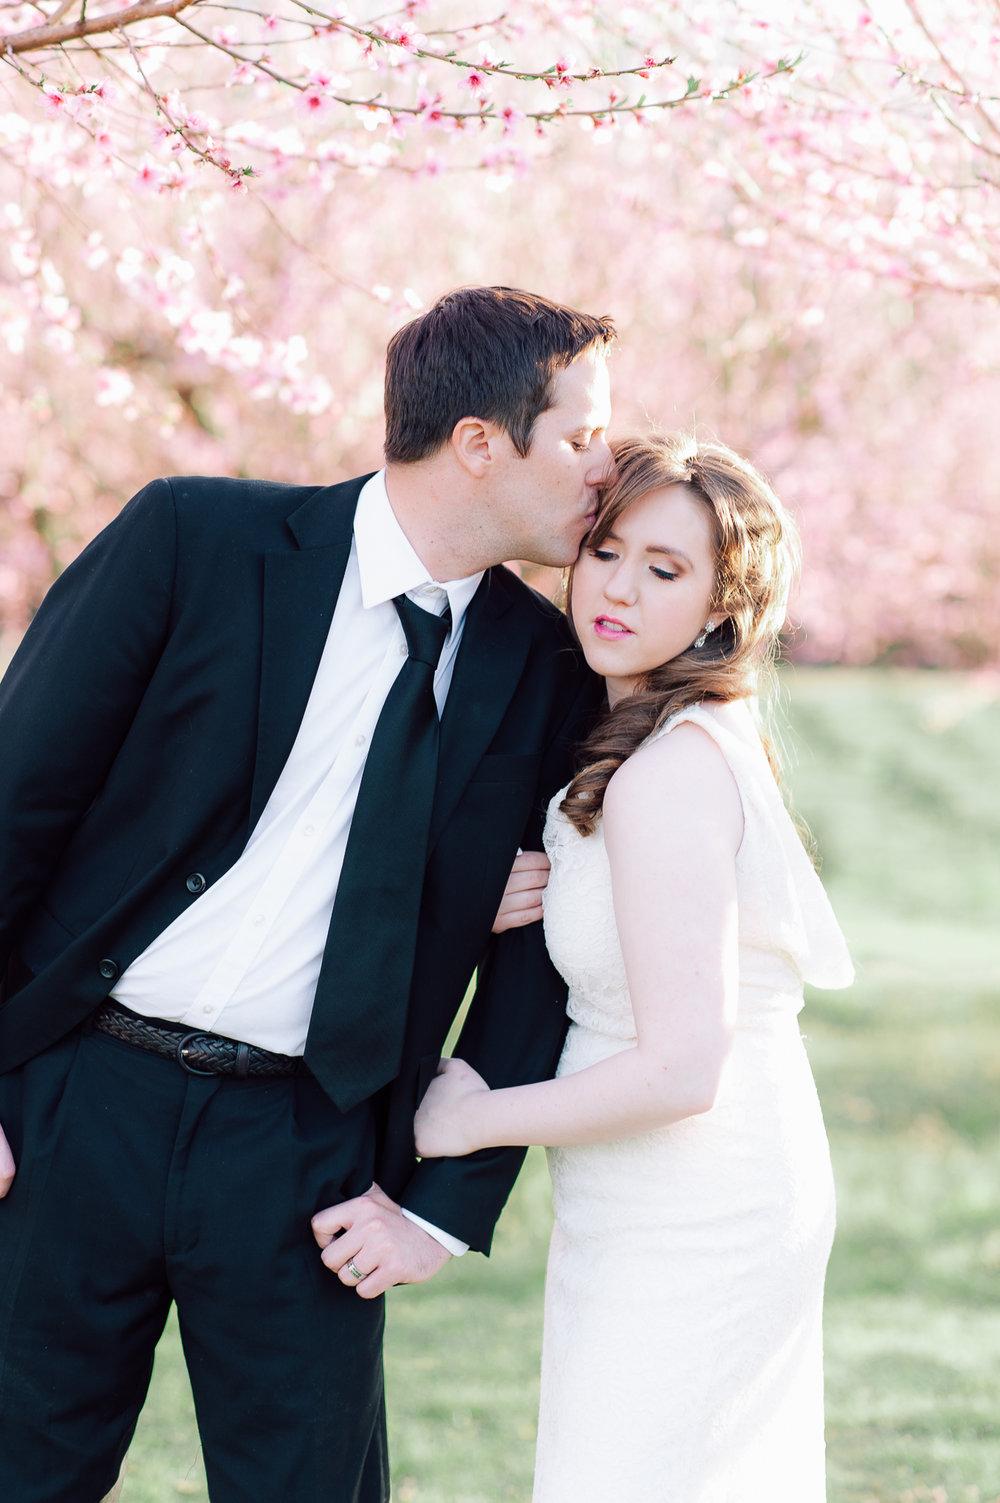 springwedding_cherryblossoms_virginiaphotographer_youseephotography_styledshoot (554).jpg